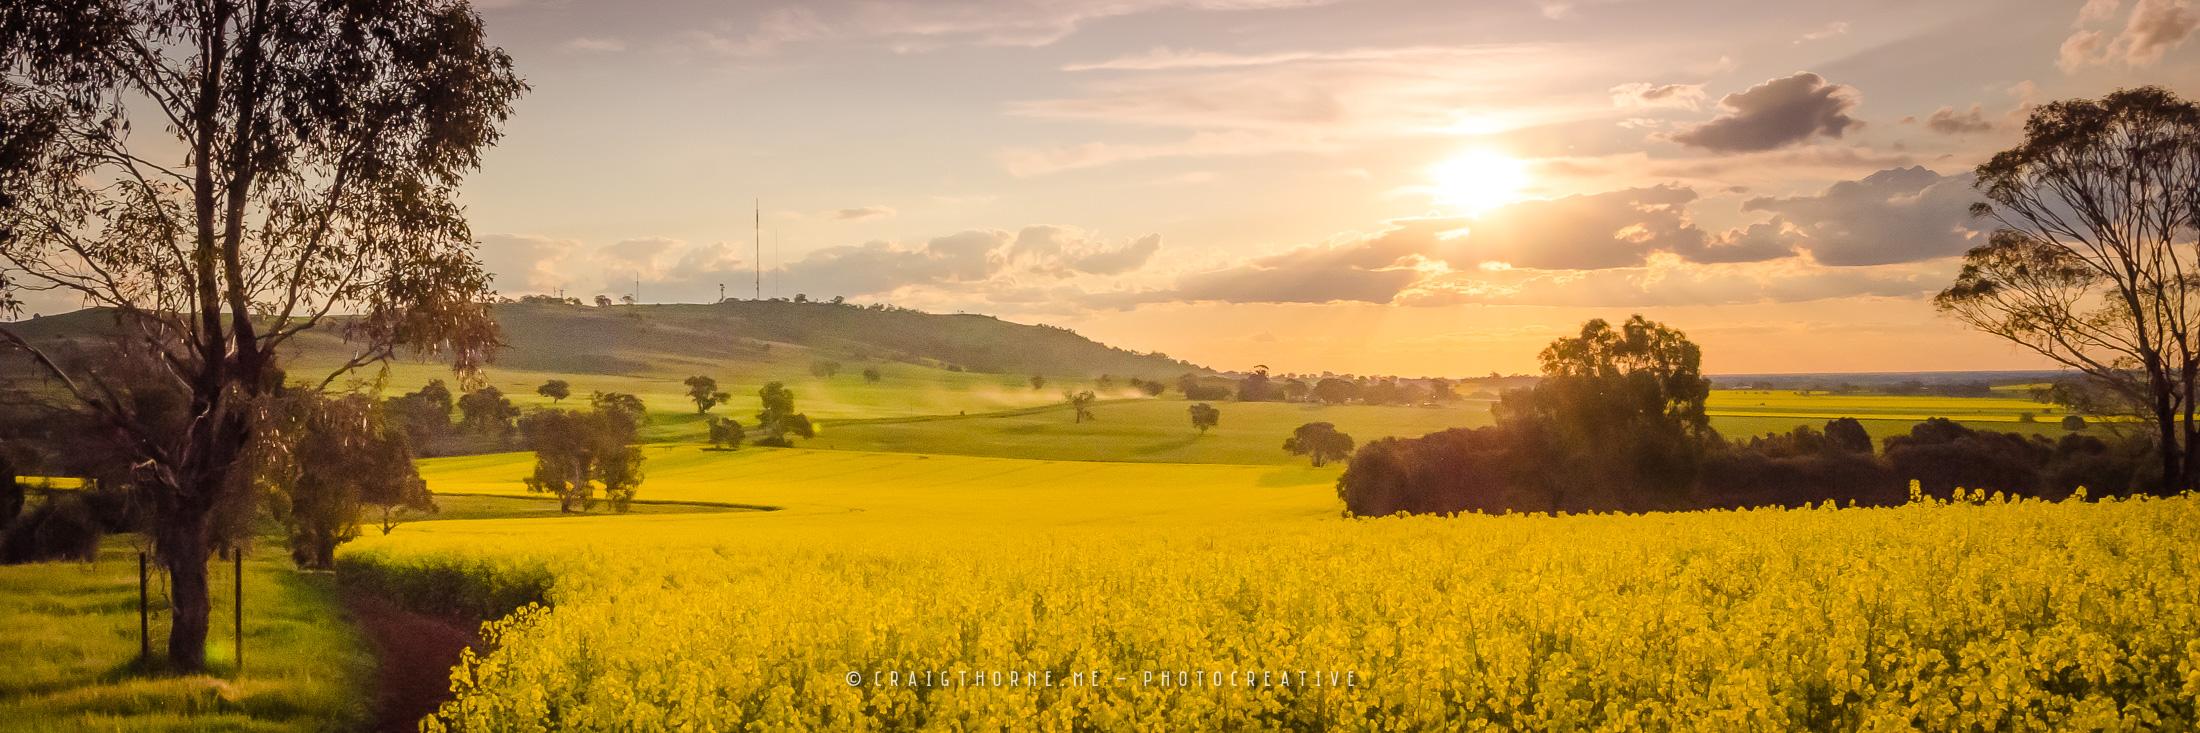 20150920-07-Panoramas-by-Craig-Thorne-THN_8331.jpg